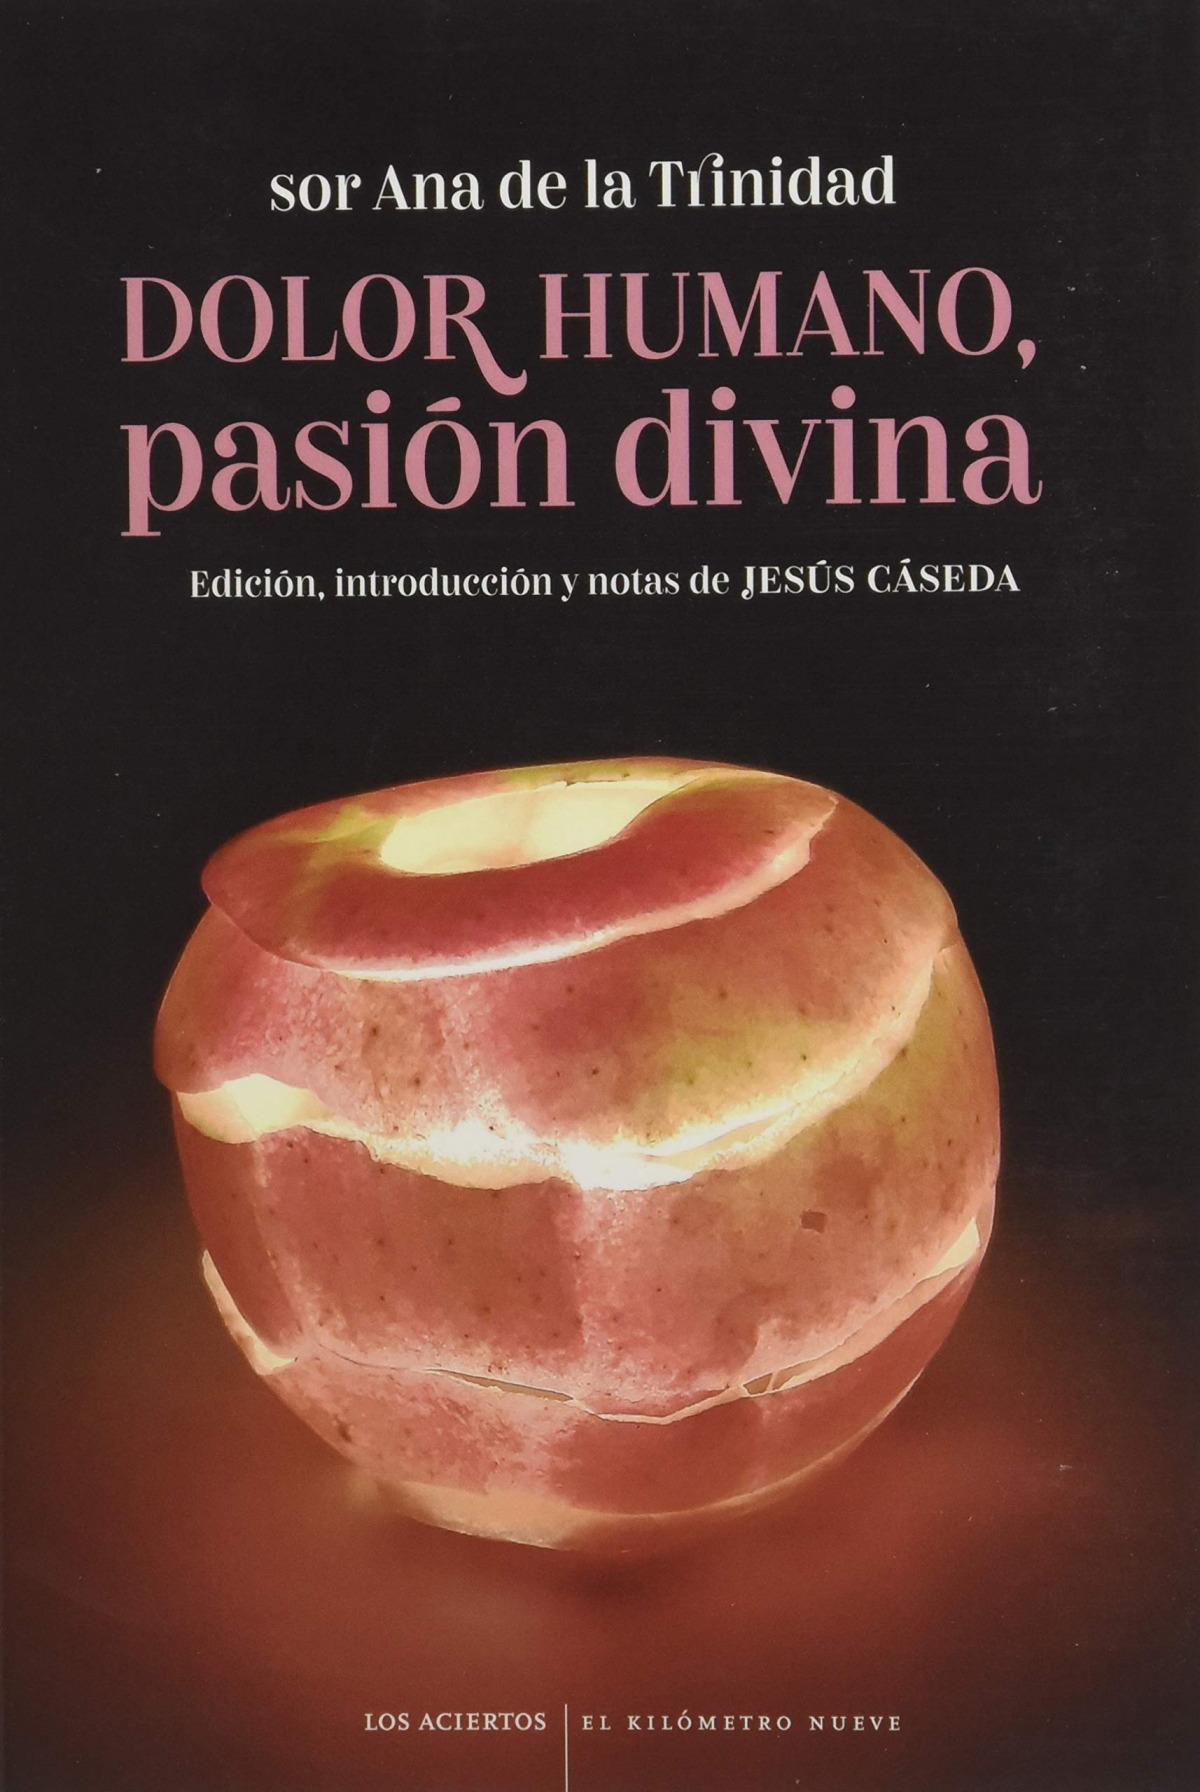 Dolor humano, pasión divina